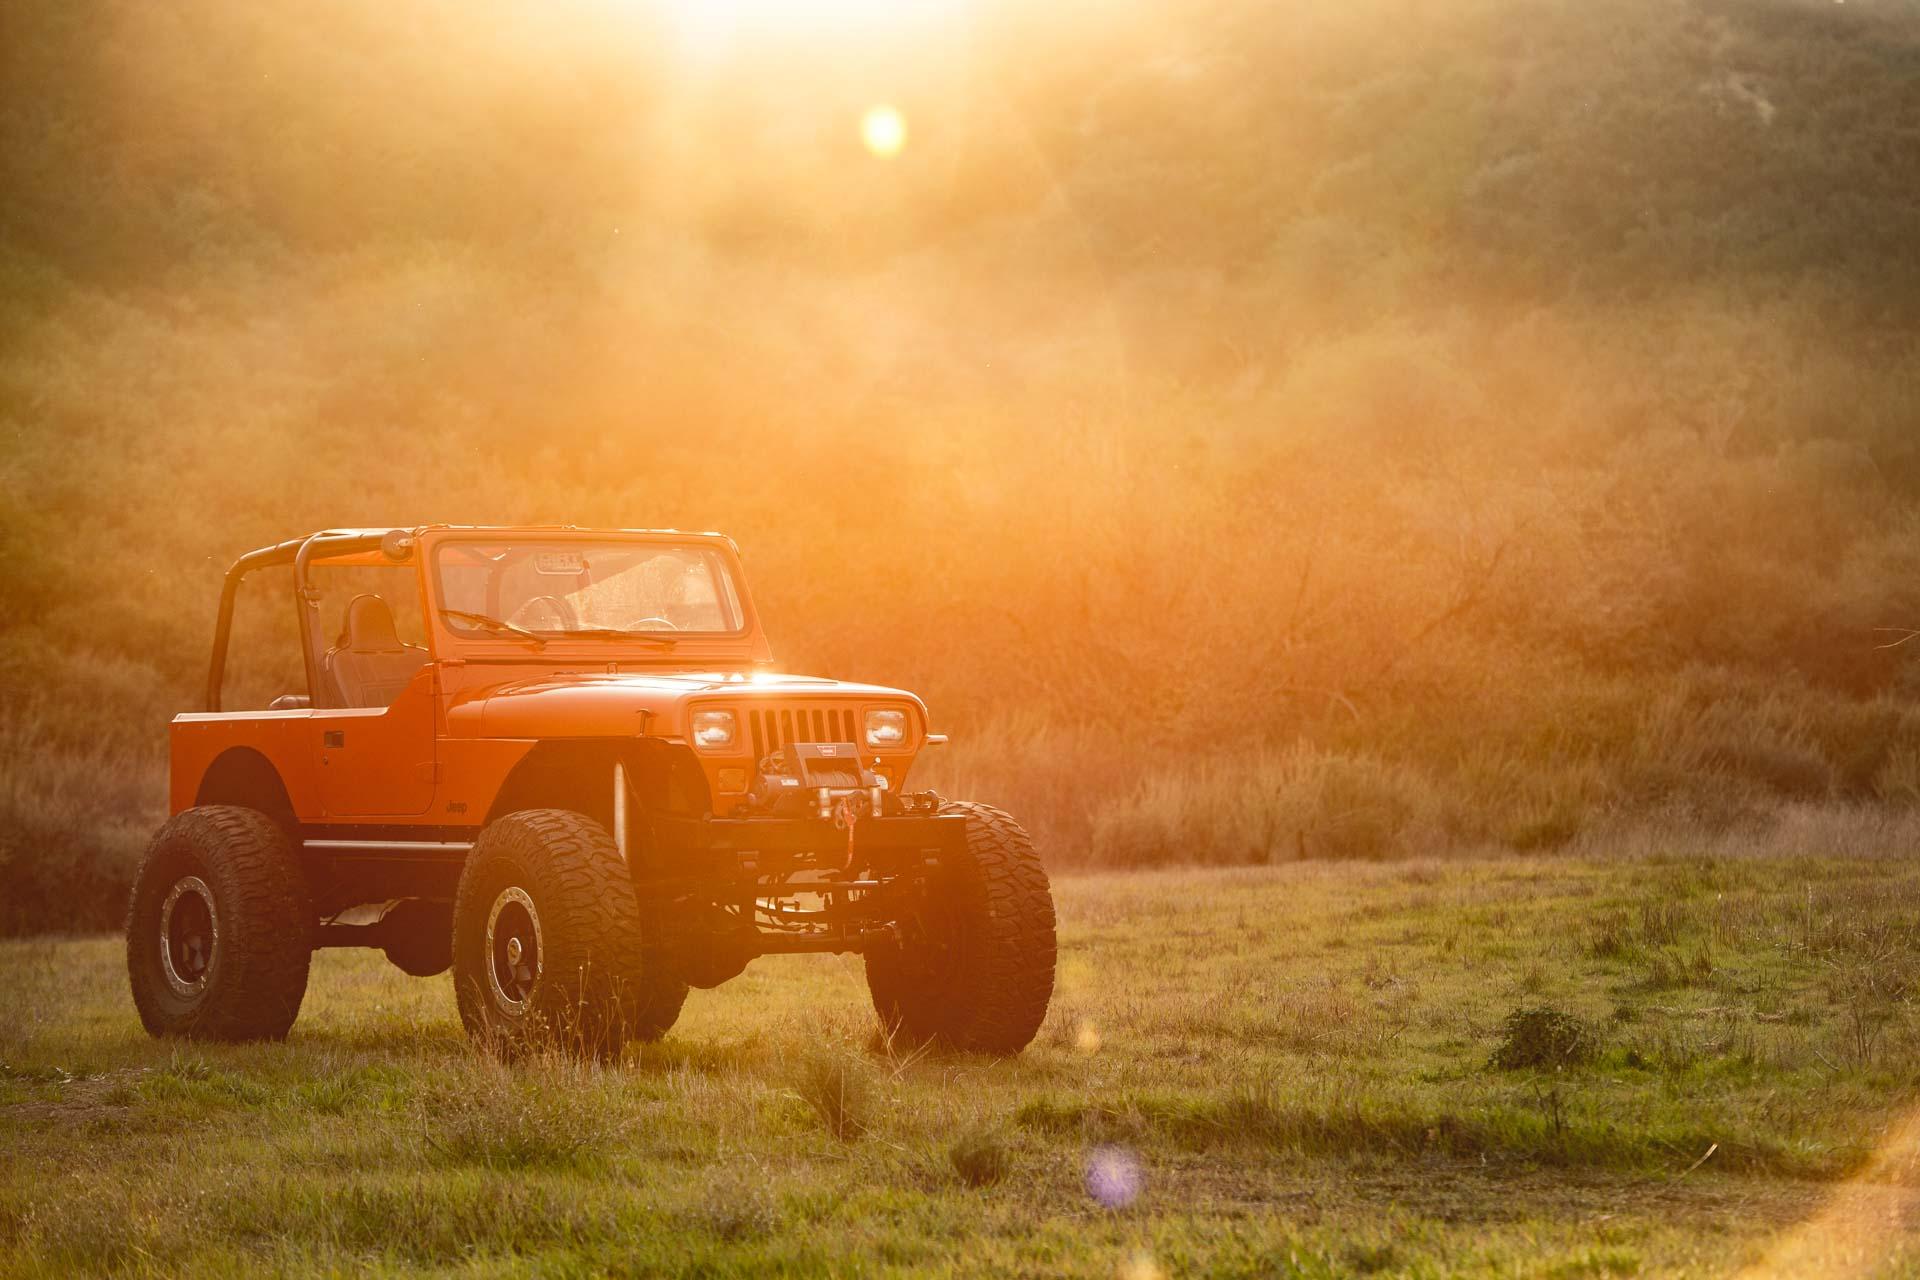 40 inch Milestar Patagonia Tires on Jeep YJ